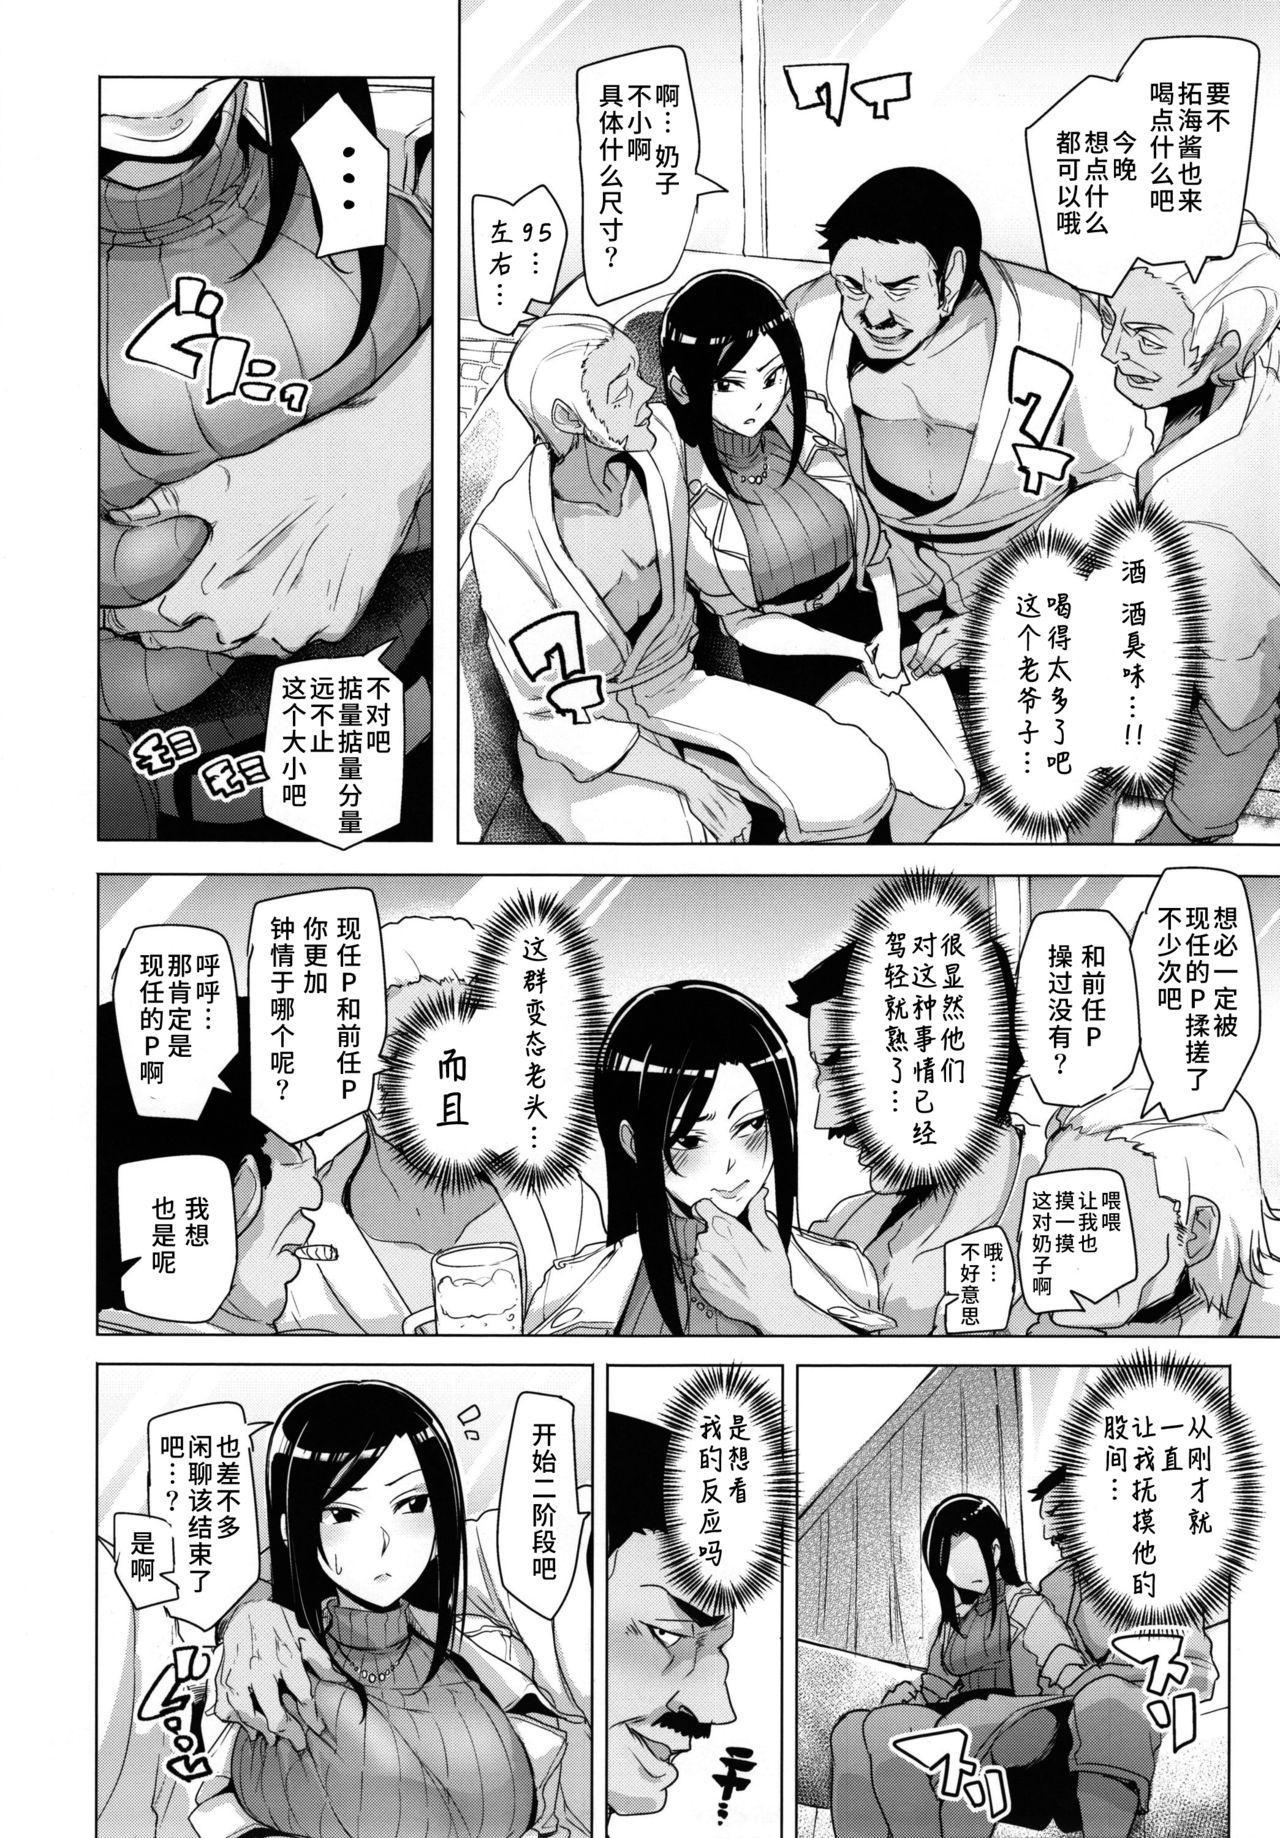 Shinai Max Mattanashi! 3 | Max Affection System! 3 7